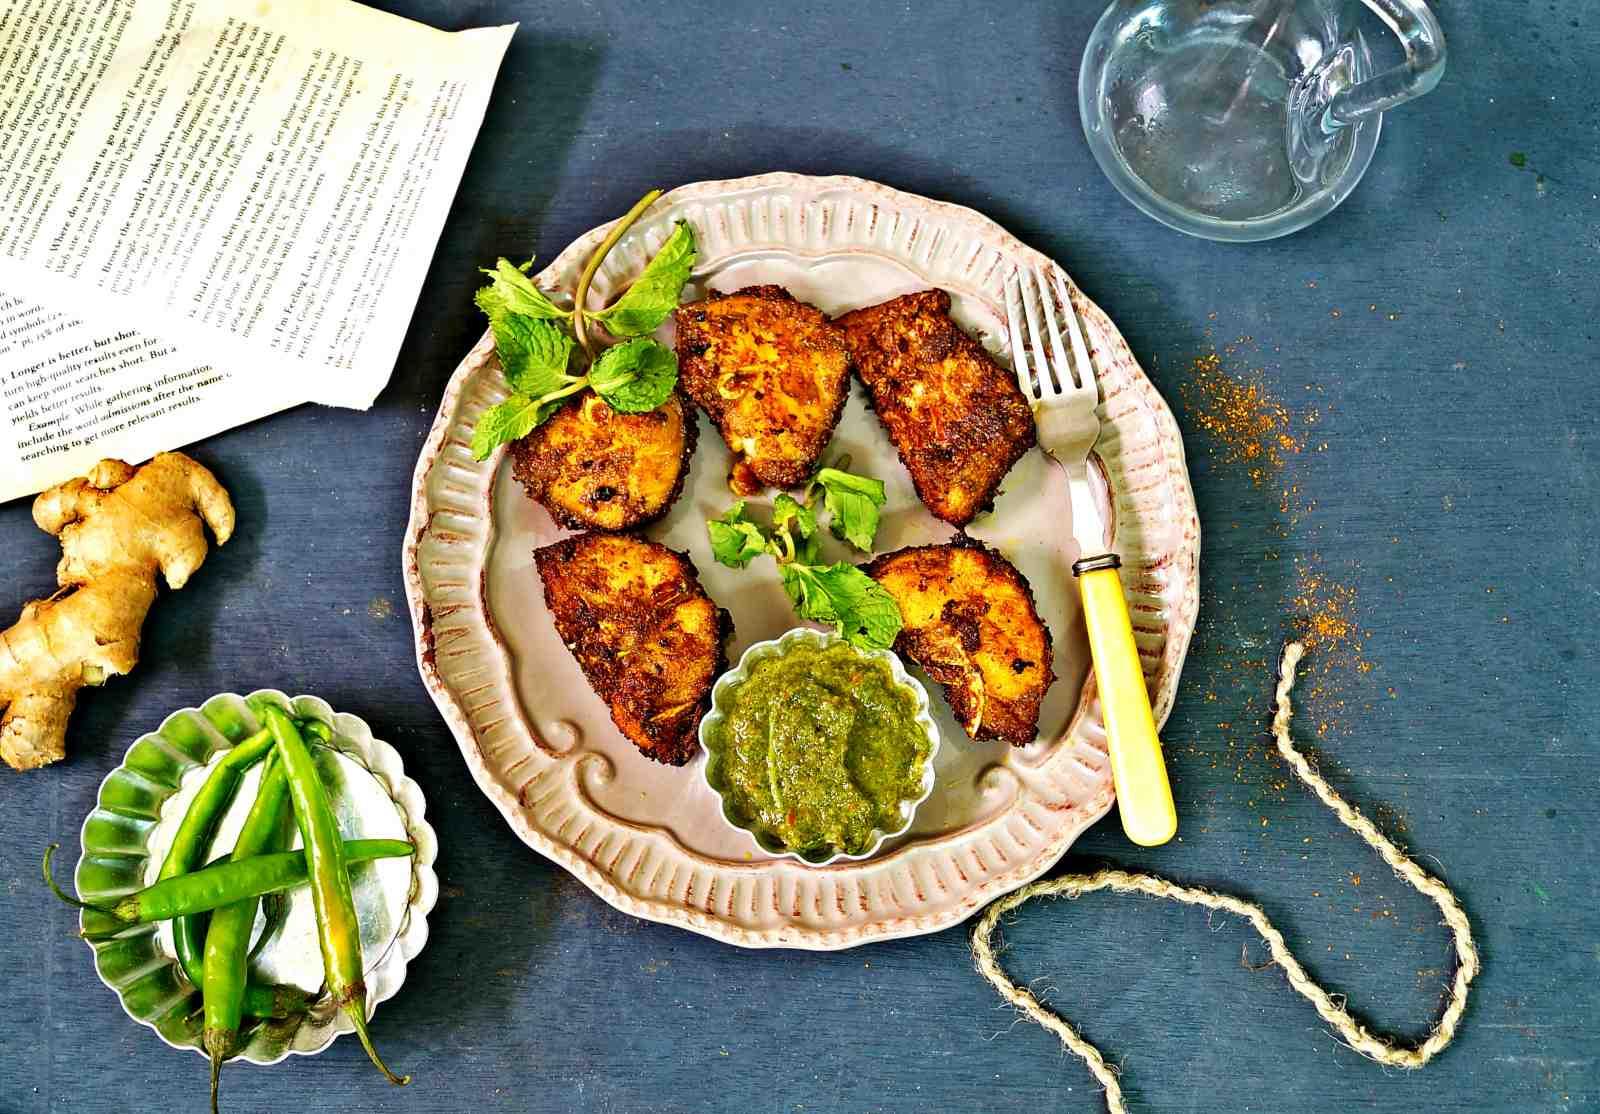 Hariyali tawa fish fry recipe by archanas kitchen hariyali tawa fish fry recipe forumfinder Images